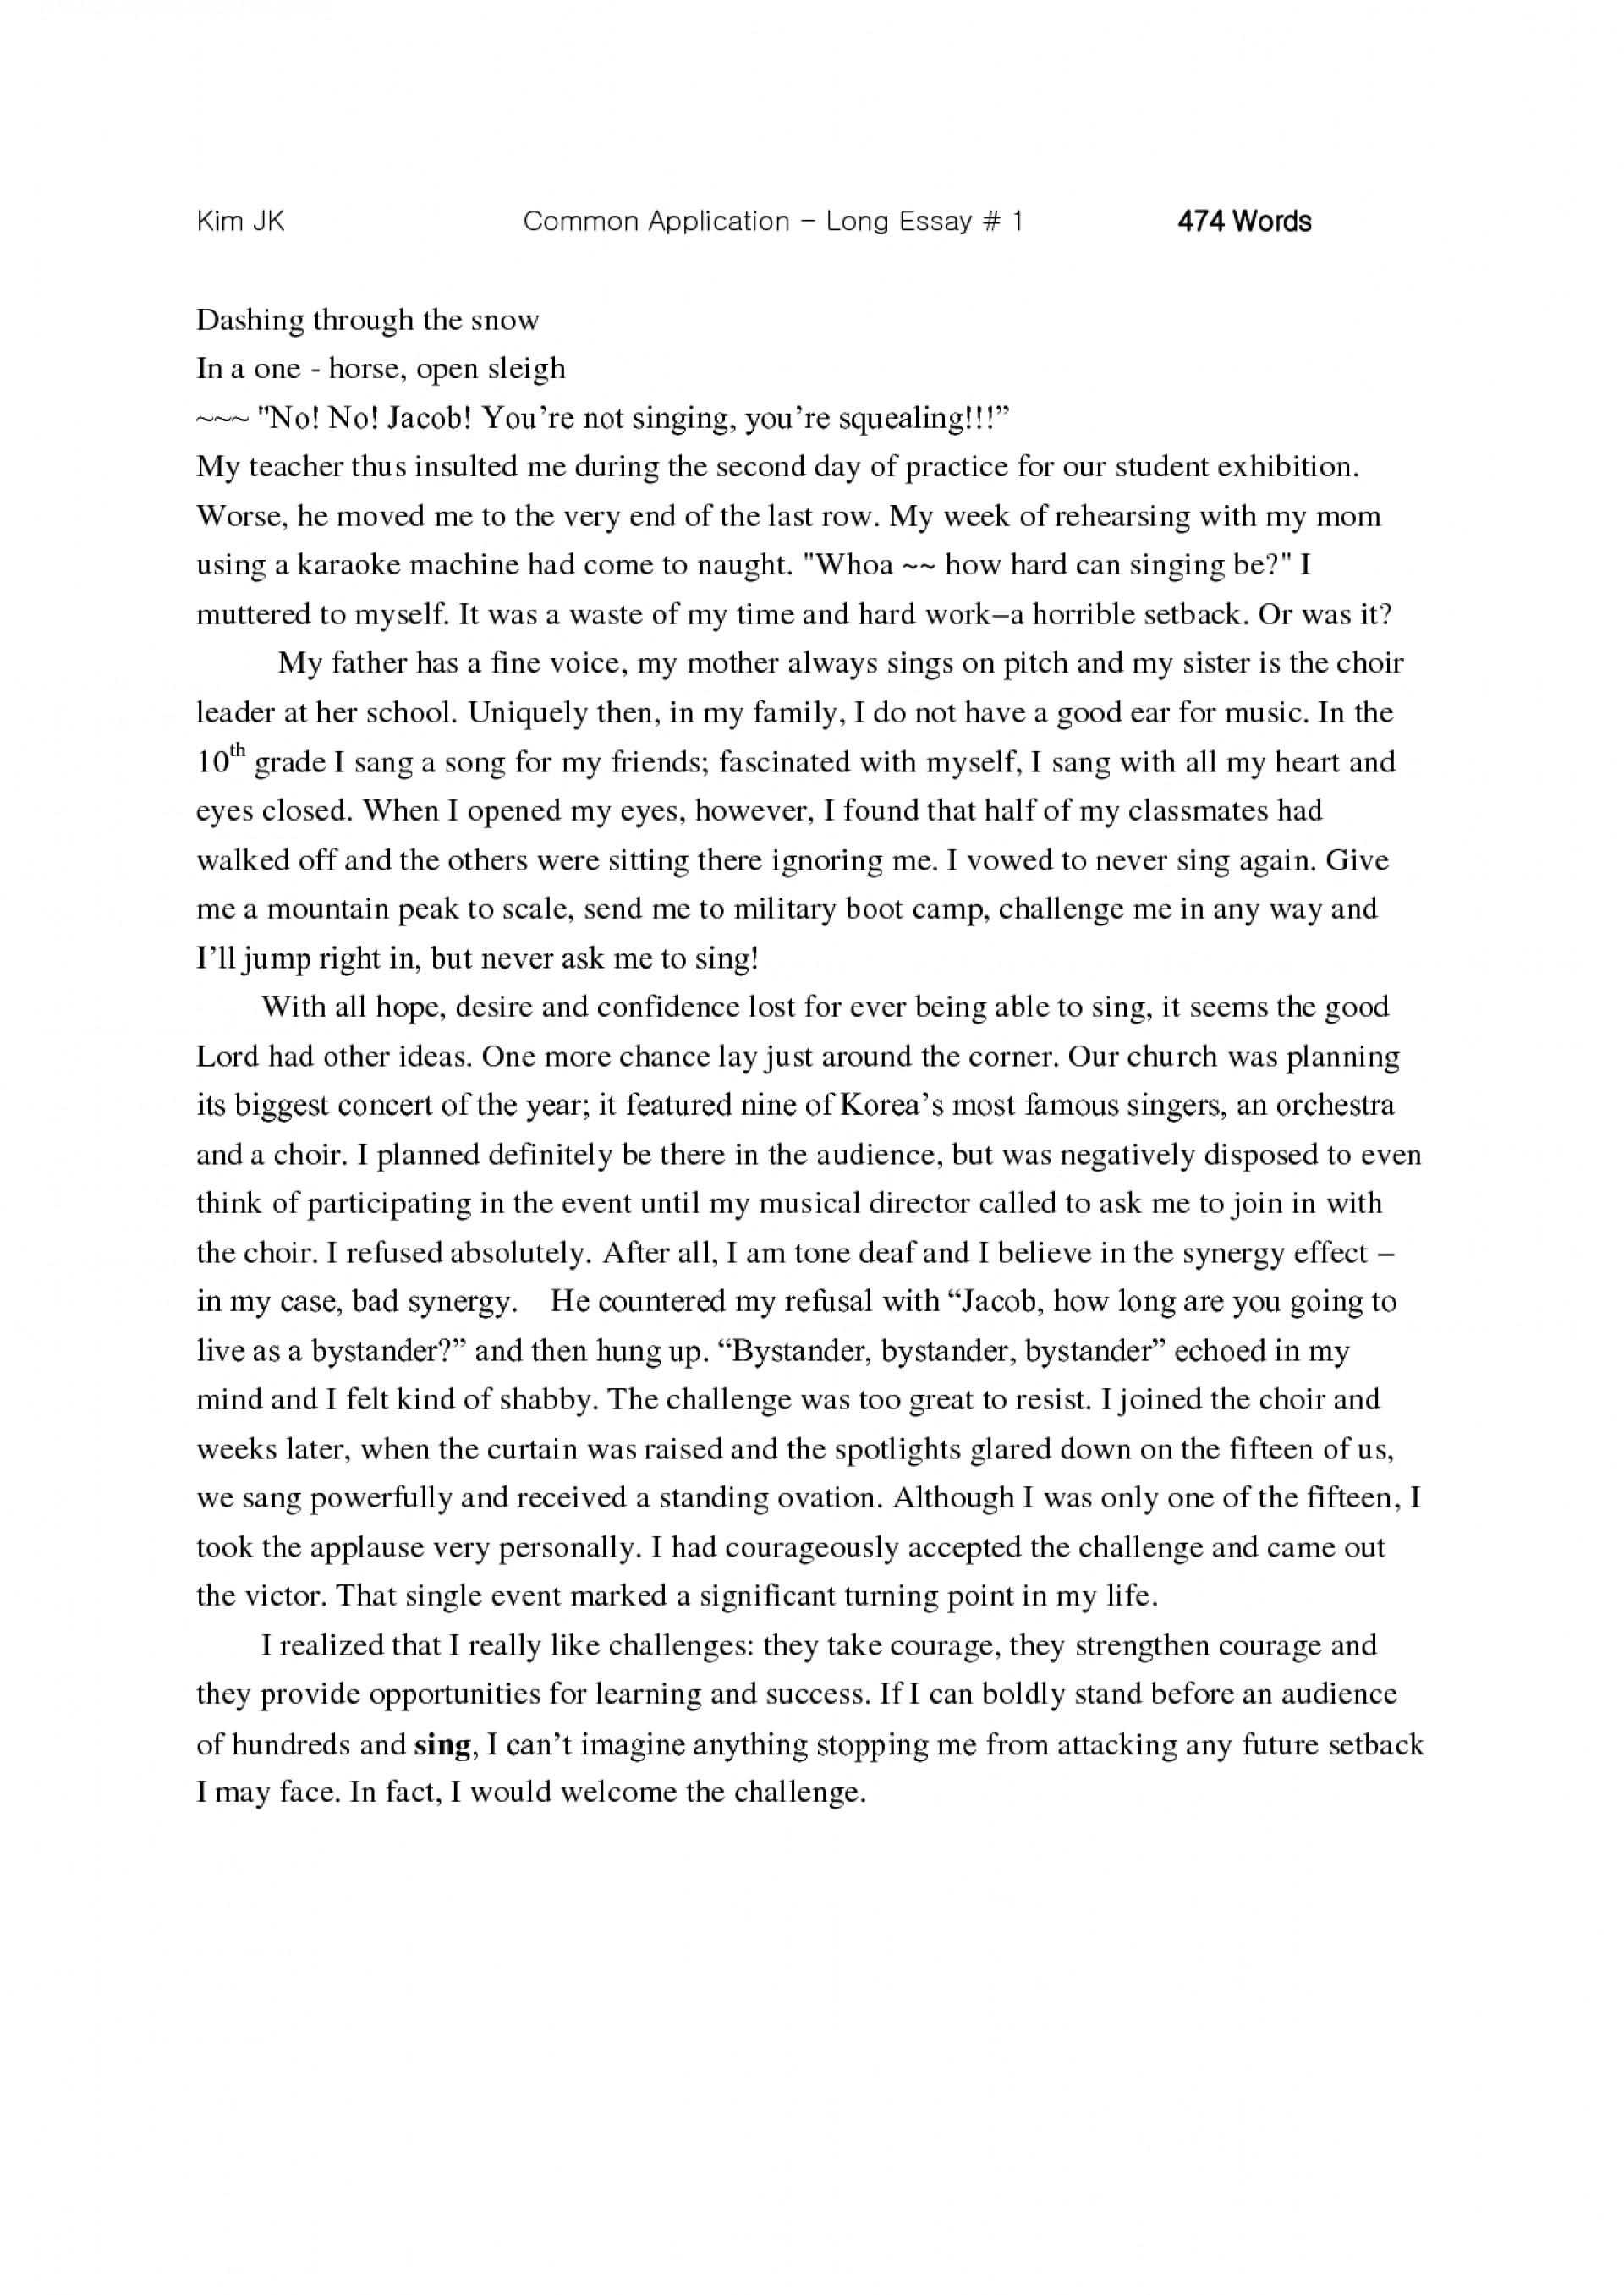 001 Good Common App Essays Resume Writing Application Essay Help Cnessayjuvi Ideas Outstanding Examples Option 2 2017 1920